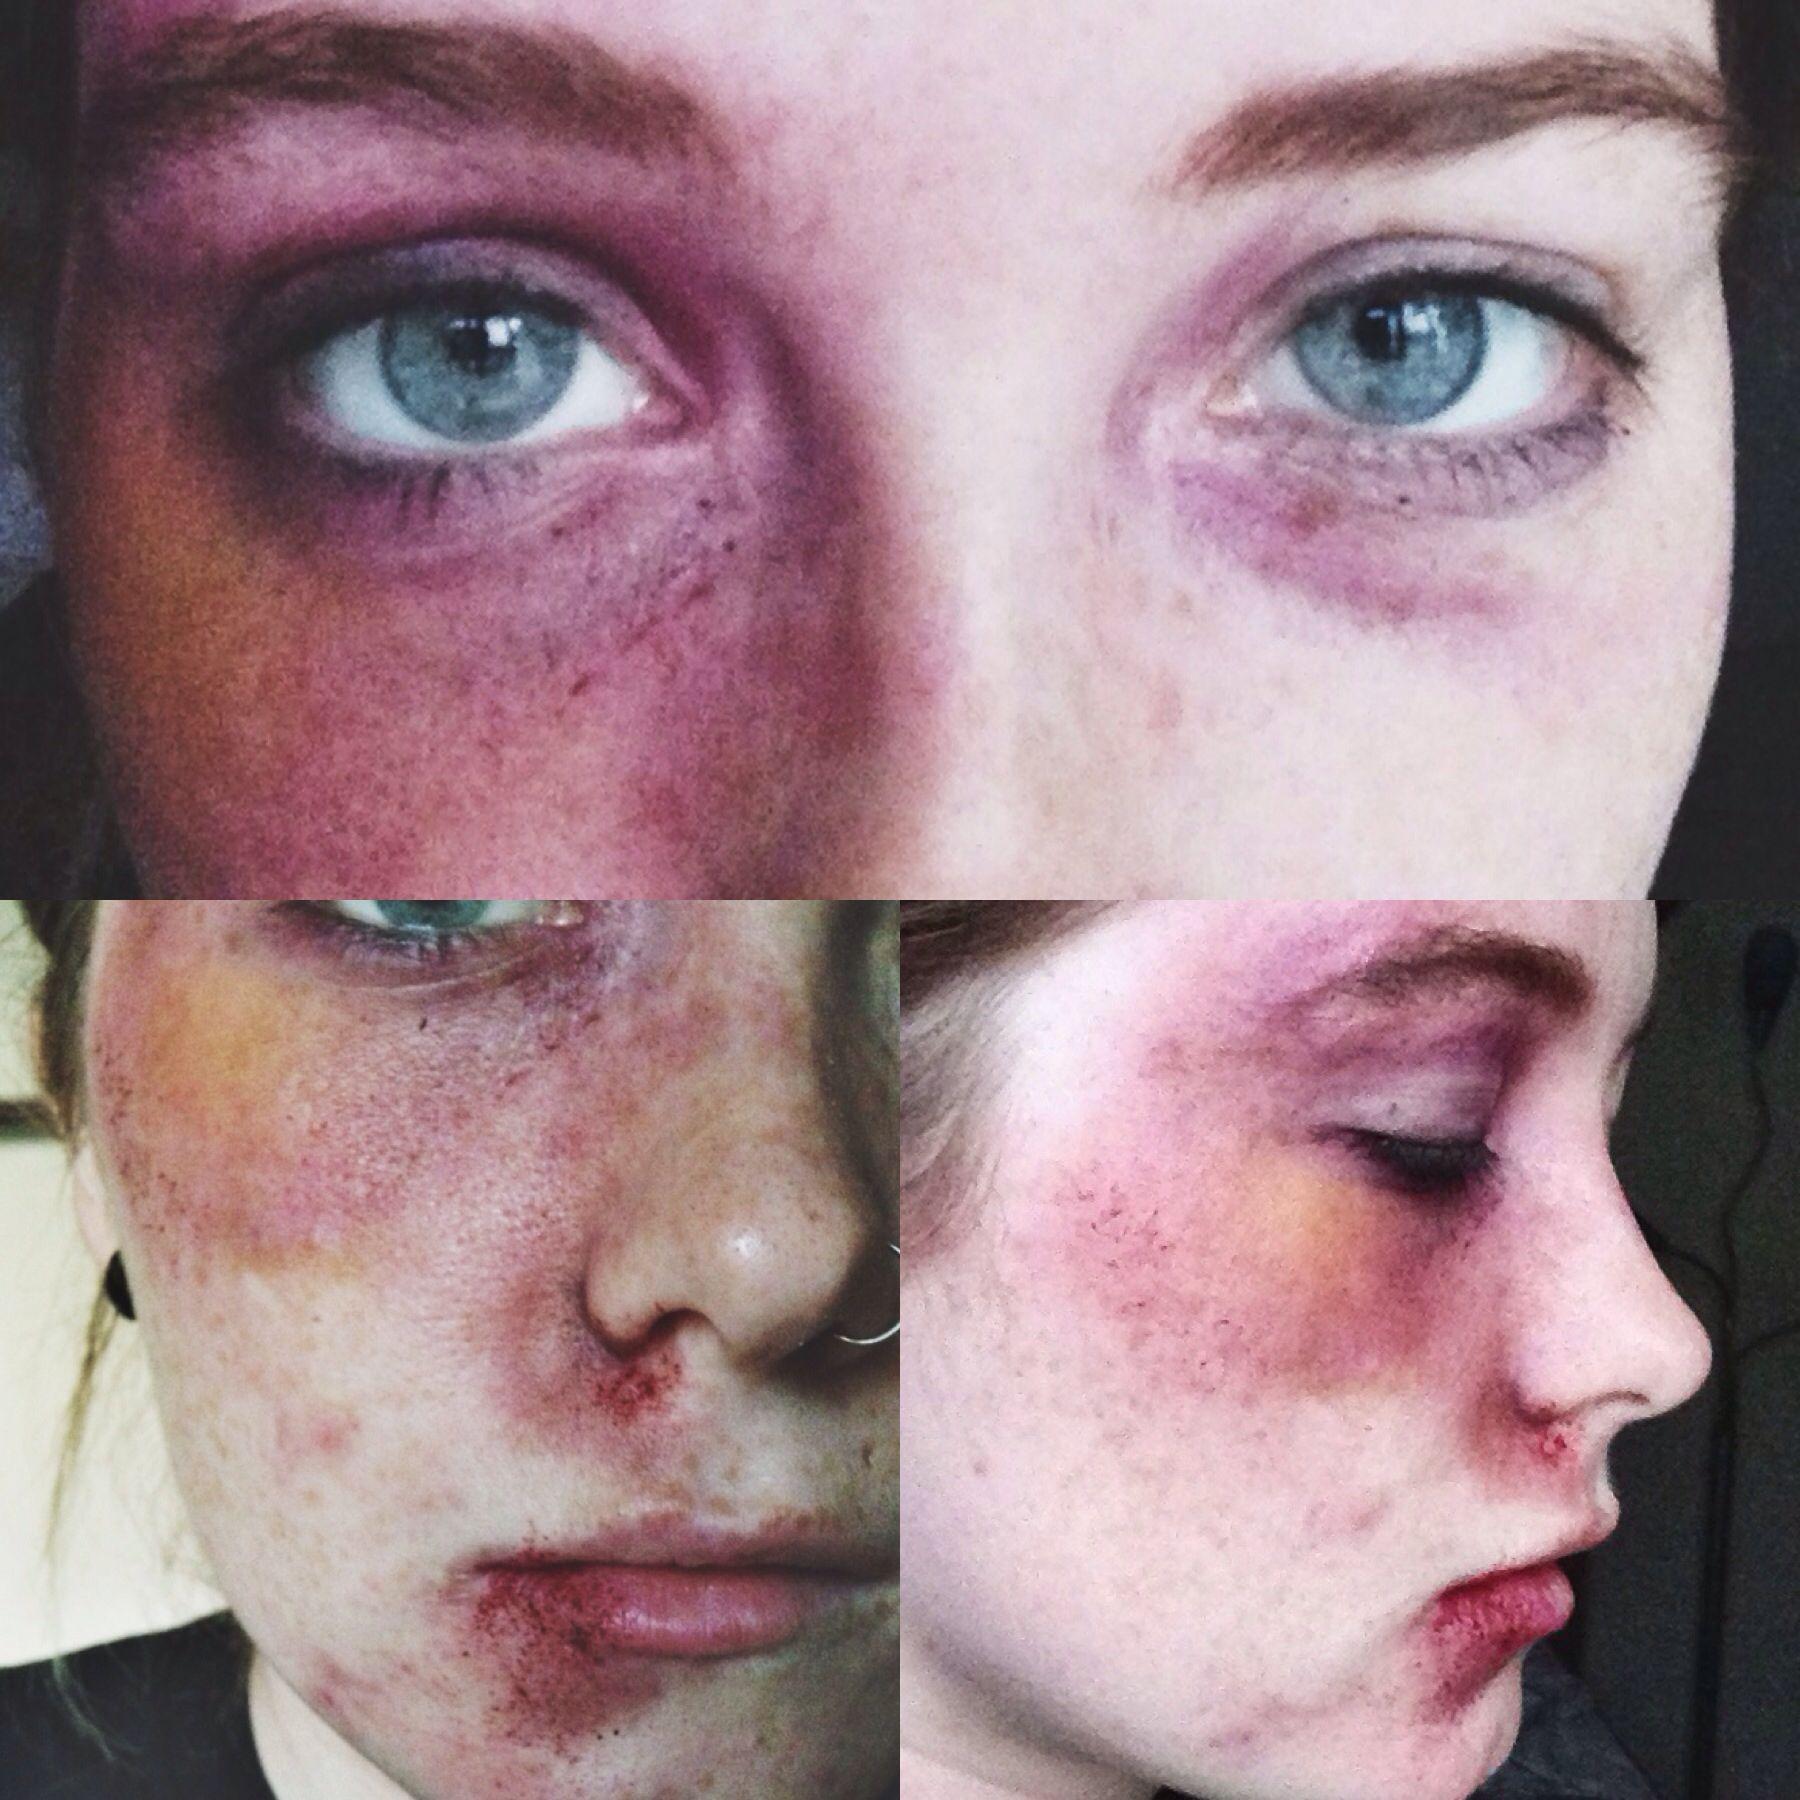 Black eye/bruising makeup | Stage Makeup Morgue | Pinterest ...